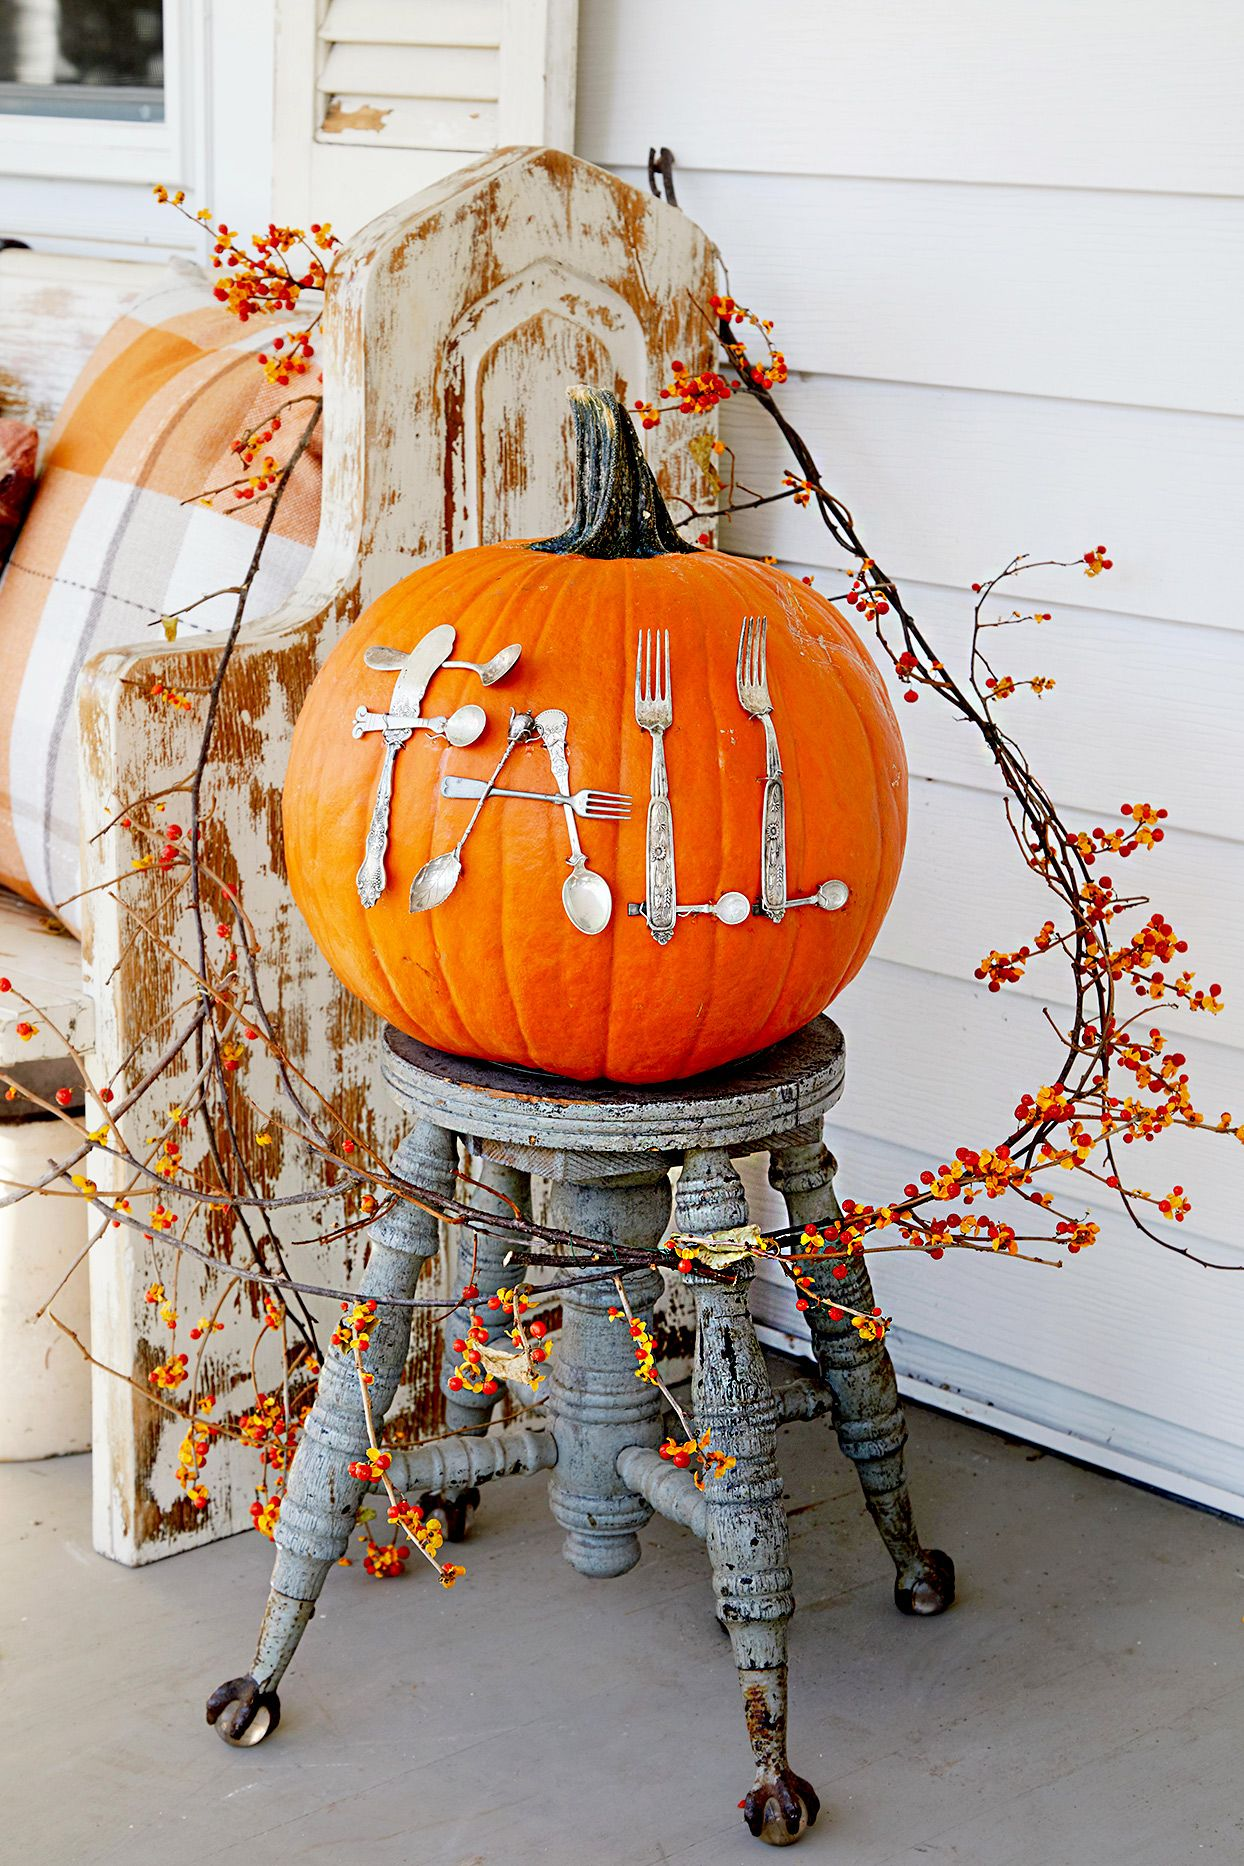 Beautiful Pumpkin Decorating Ideas To Get Your Home Ready For Fall Pumpkin Fall Decor Pumpkin Decorating Fall Pumpkin Decor